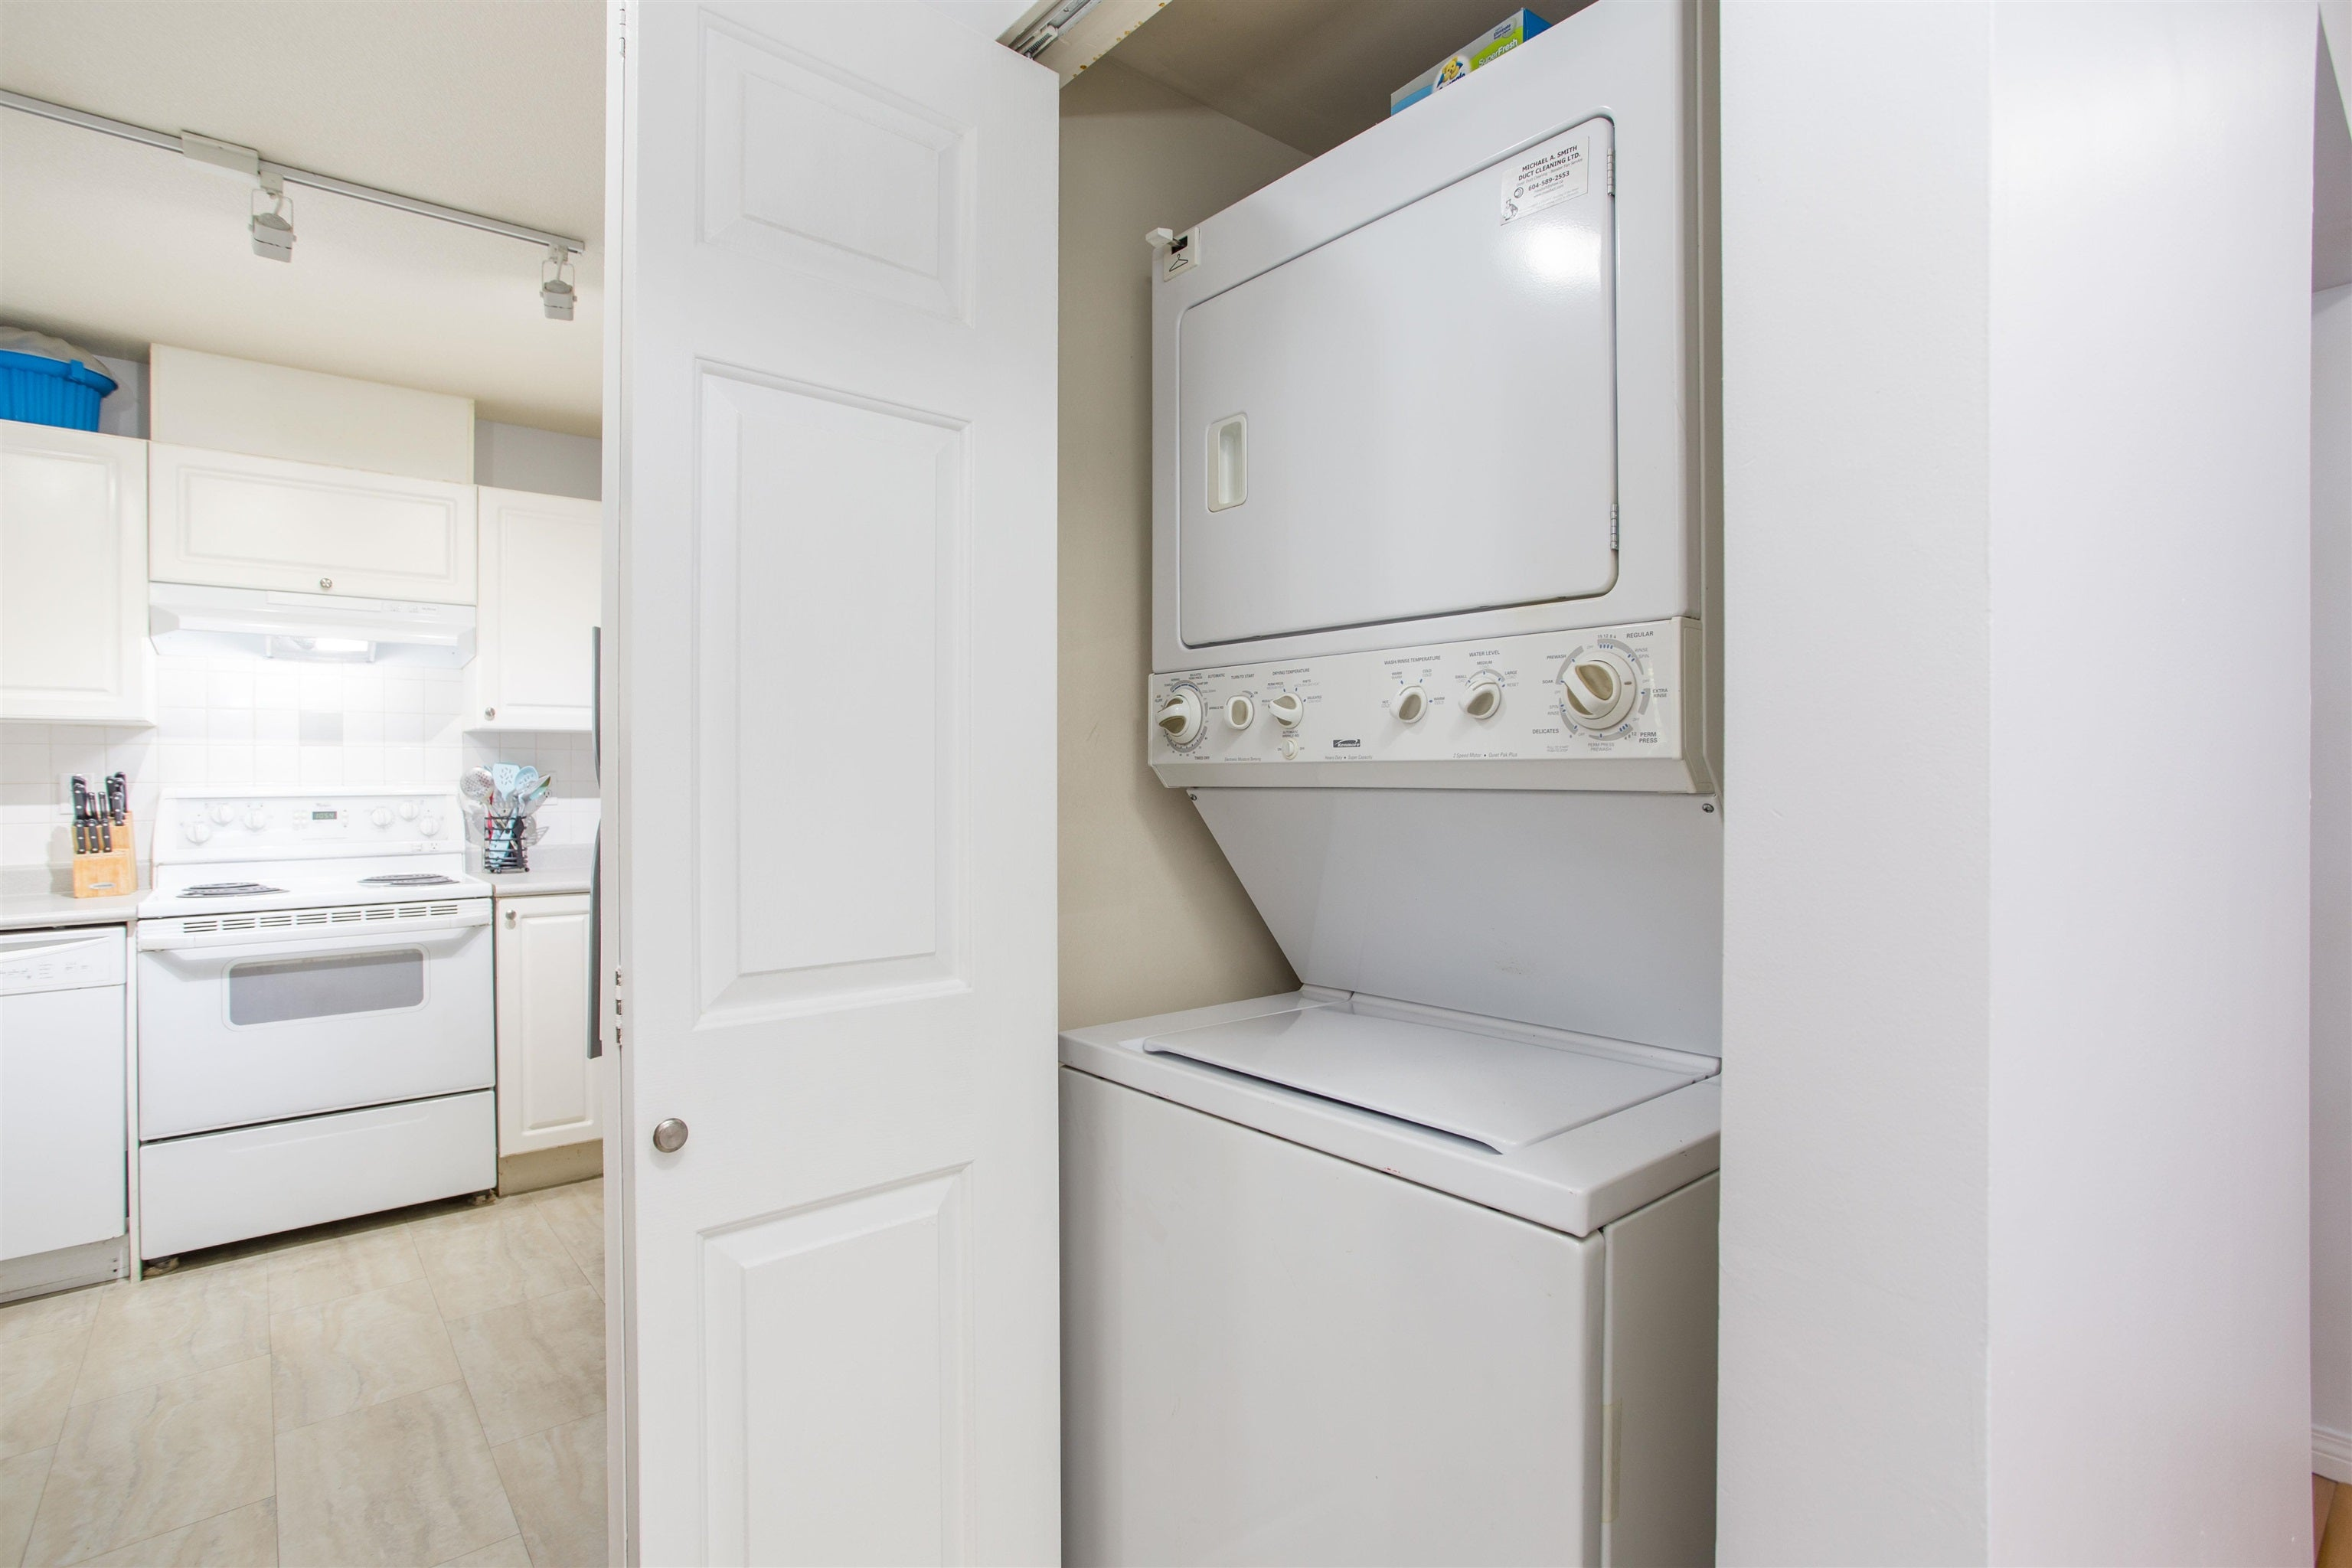 7 205 LEBLEU STREET - Maillardville Apartment/Condo for sale, 3 Bedrooms (R2625671) - #12